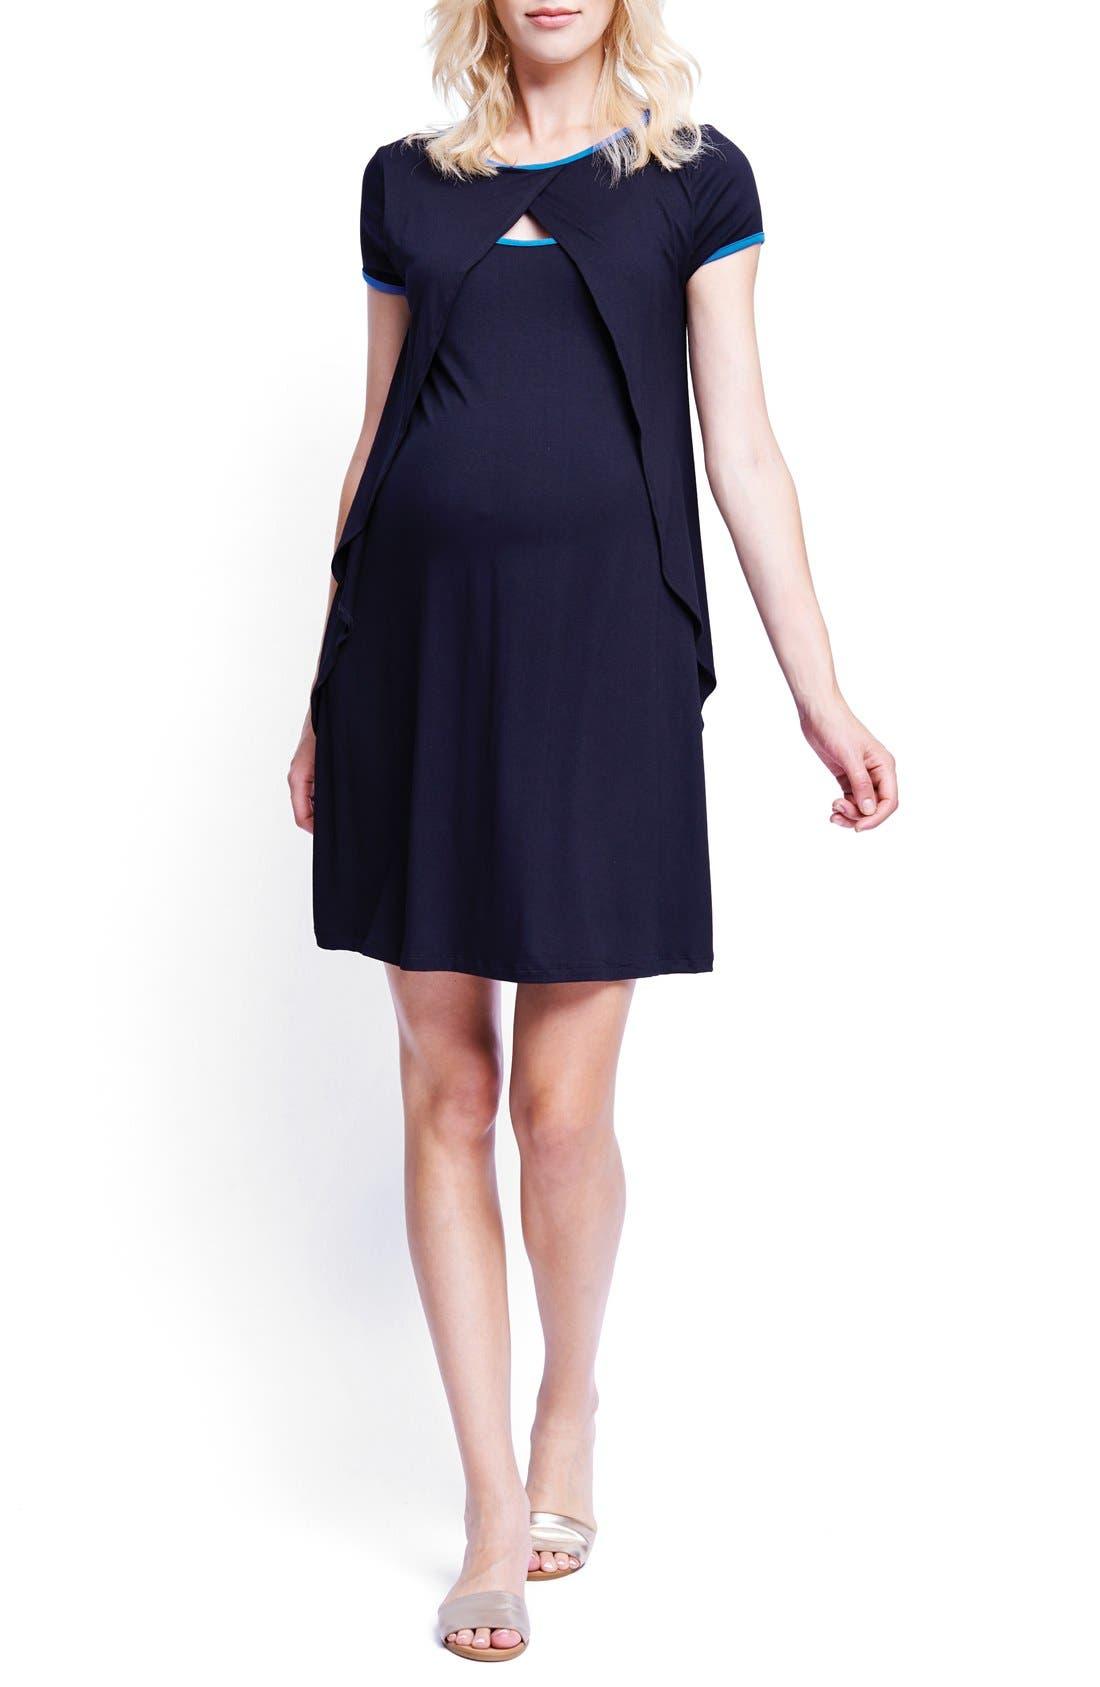 Crossover Maternity/Nursing Dress,                         Main,                         color, Blk/ Royal Blue